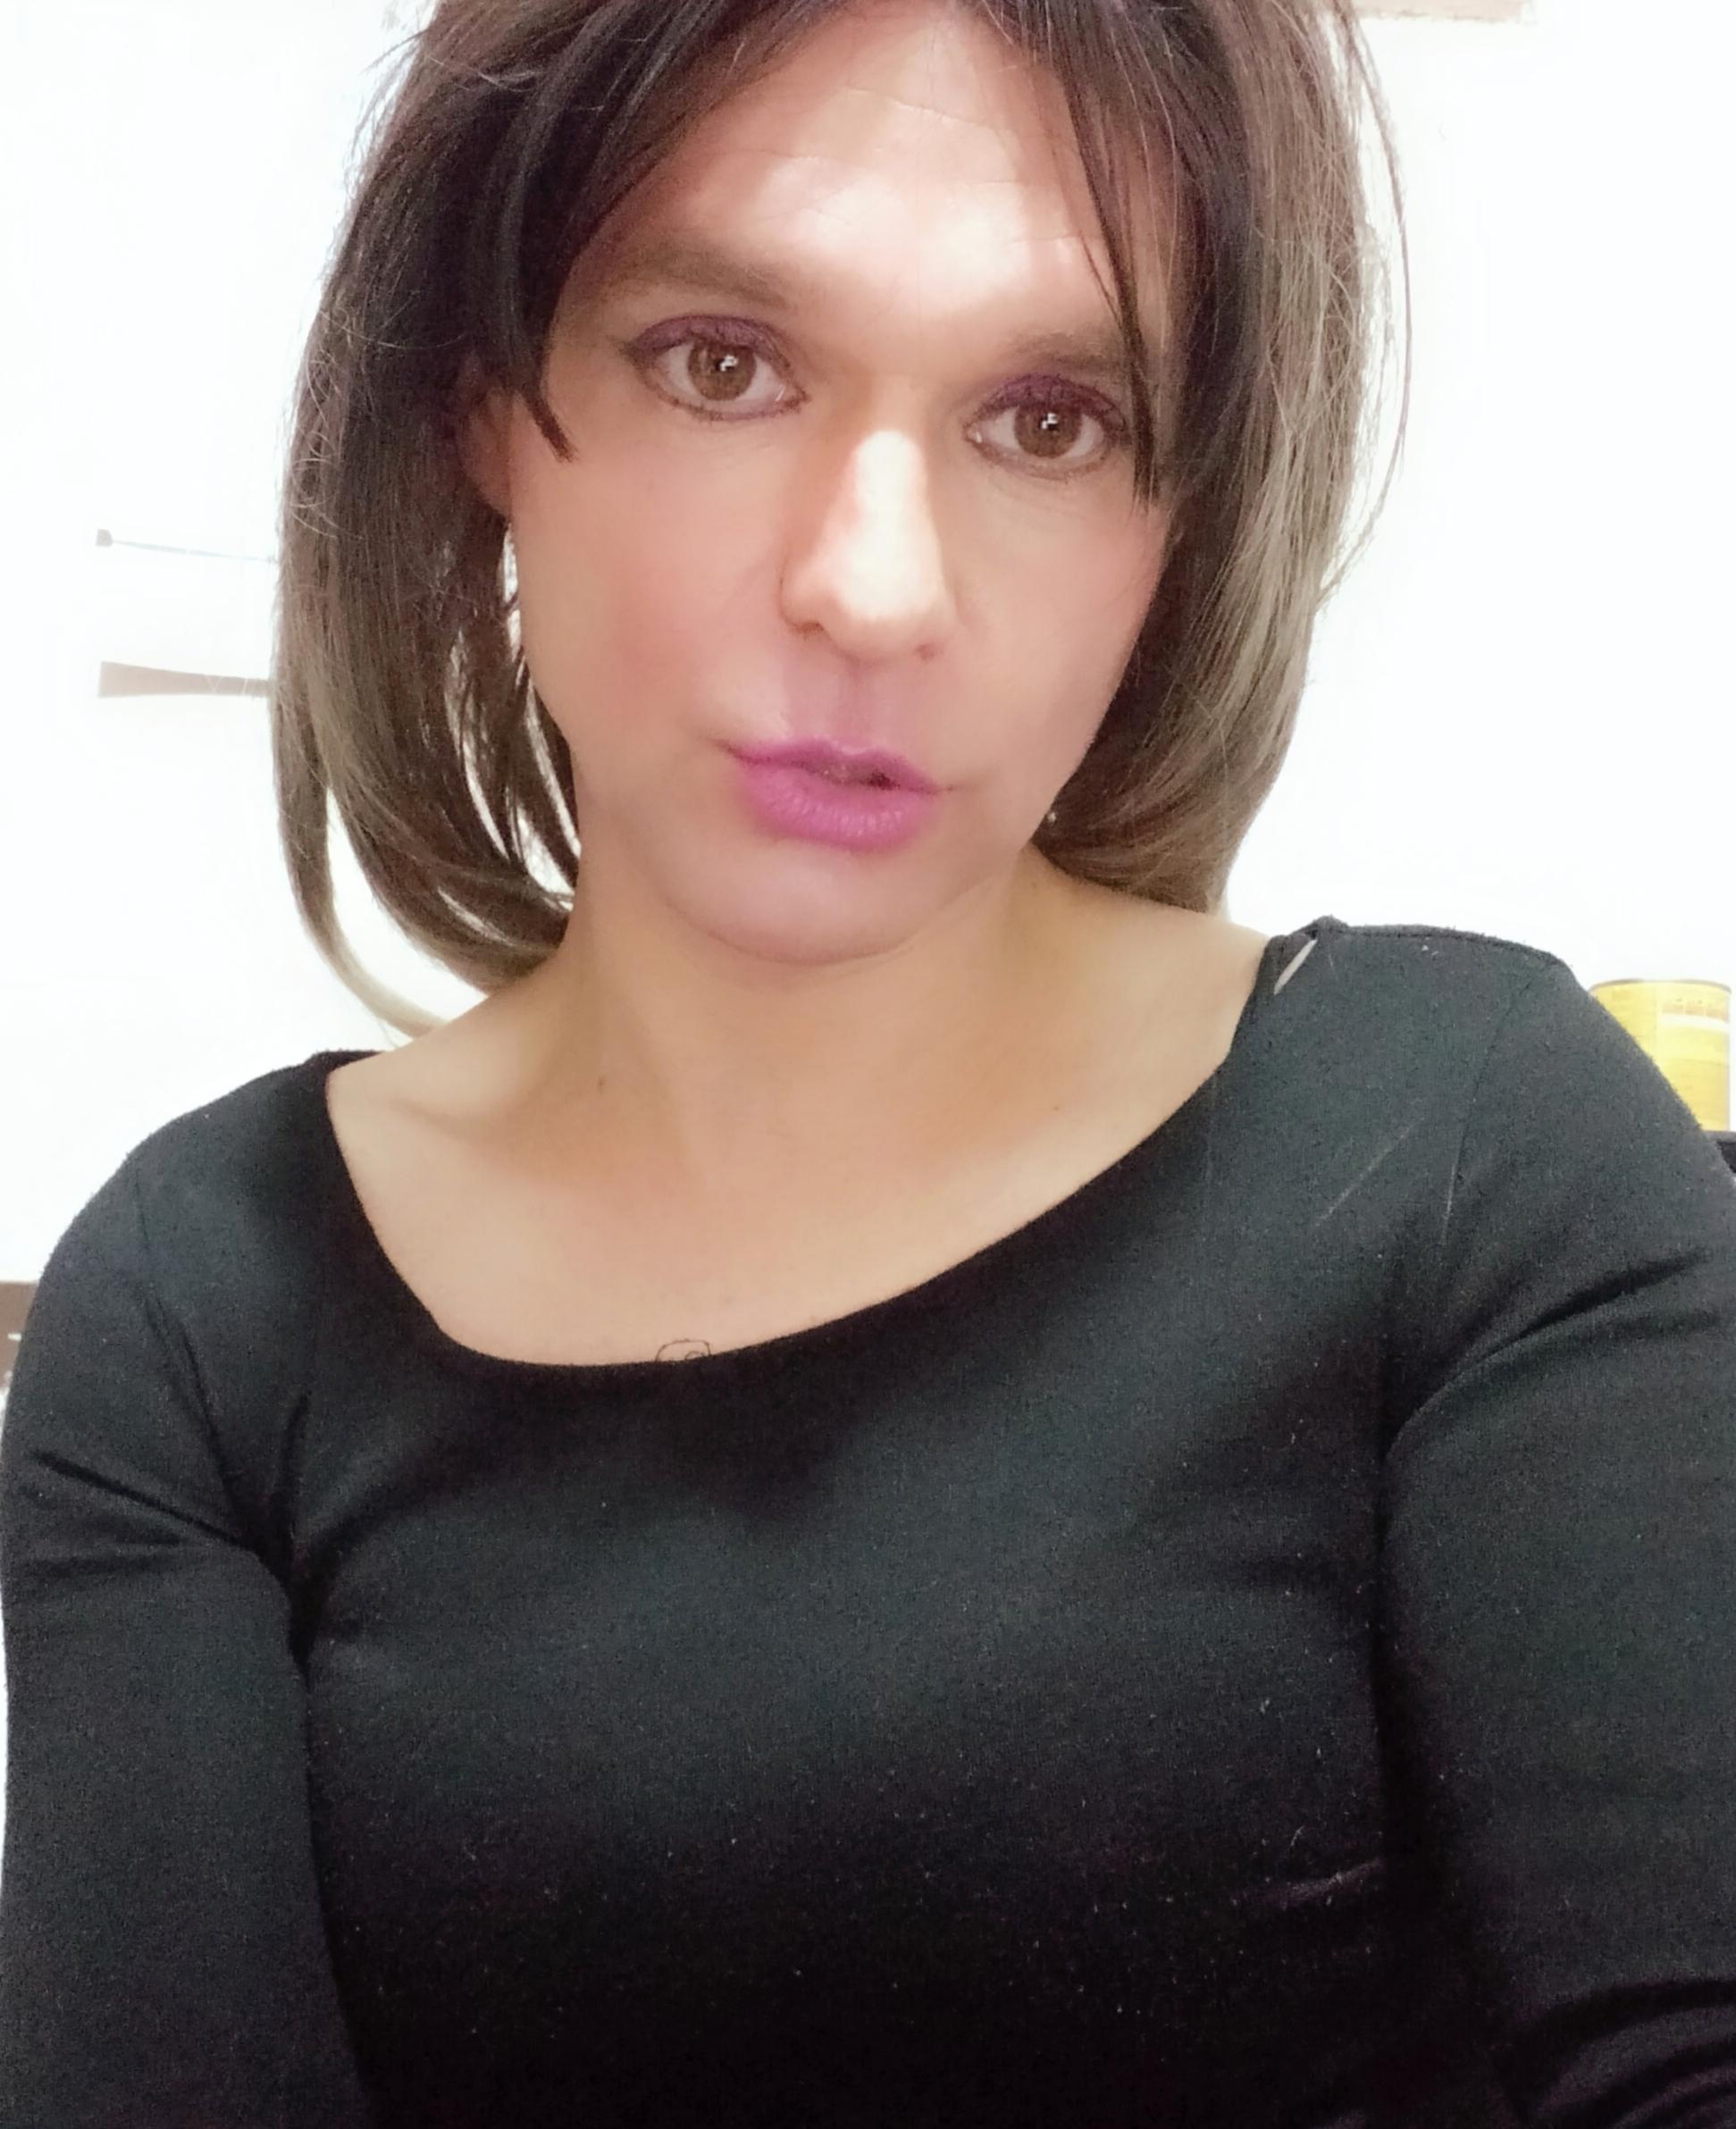 Lady sabrina tr?s=uql8bwe3vaqzlhcef2+q2rrwkm8k9vyppgi28nfmnvw=